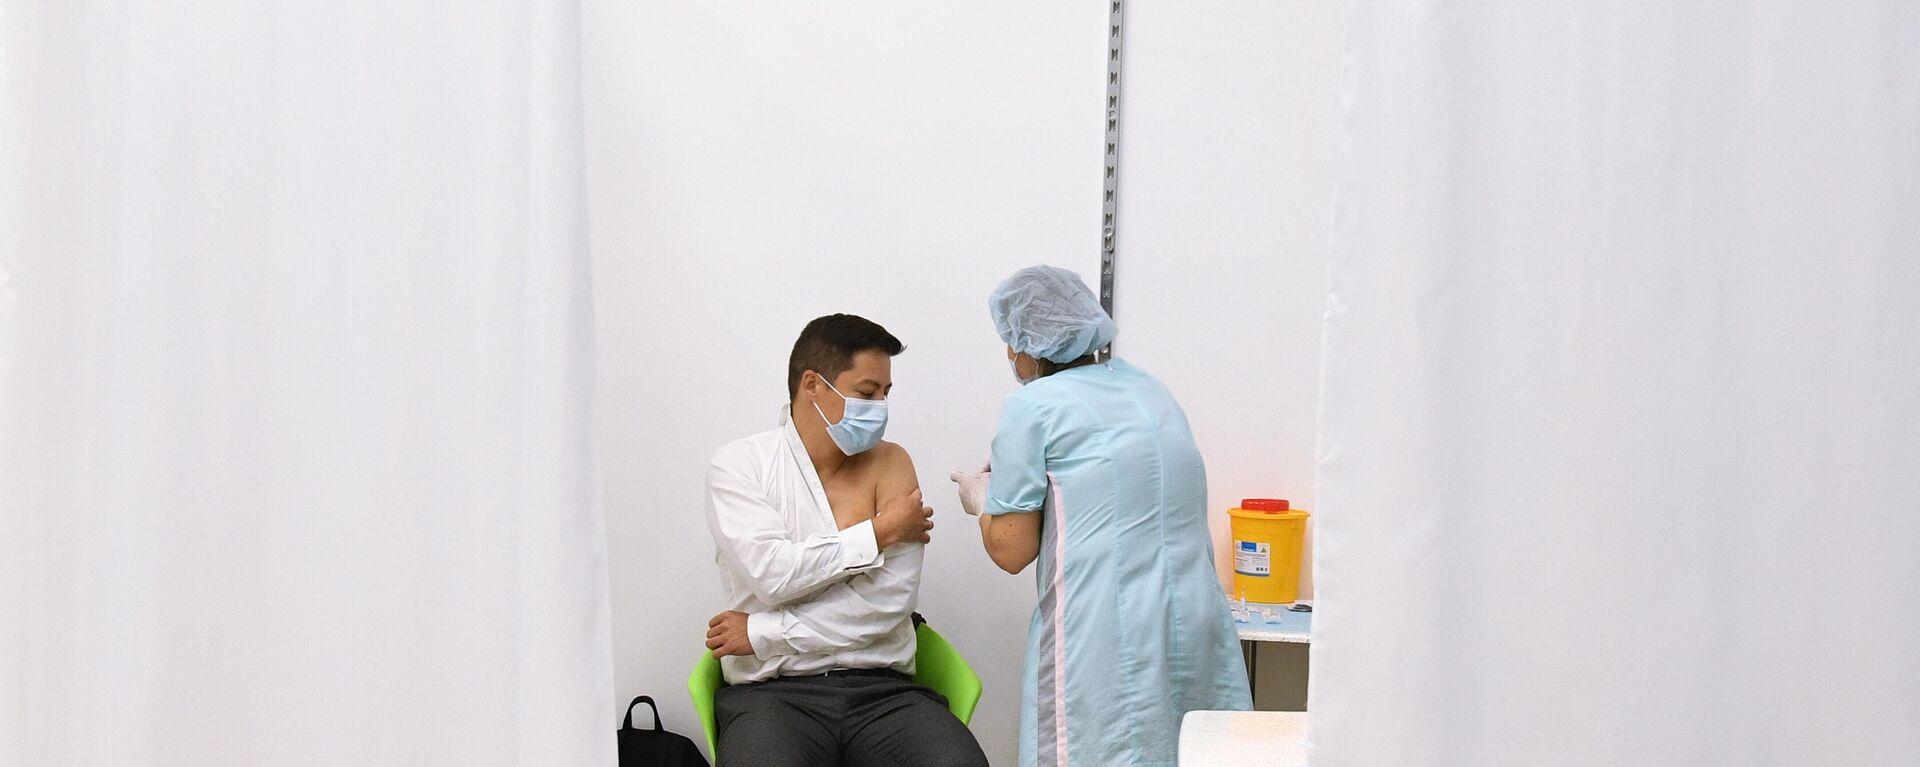 Вакцинация от COVID-19 в торговом центре в Новосибирске - Sputnik Таджикистан, 1920, 24.06.2021